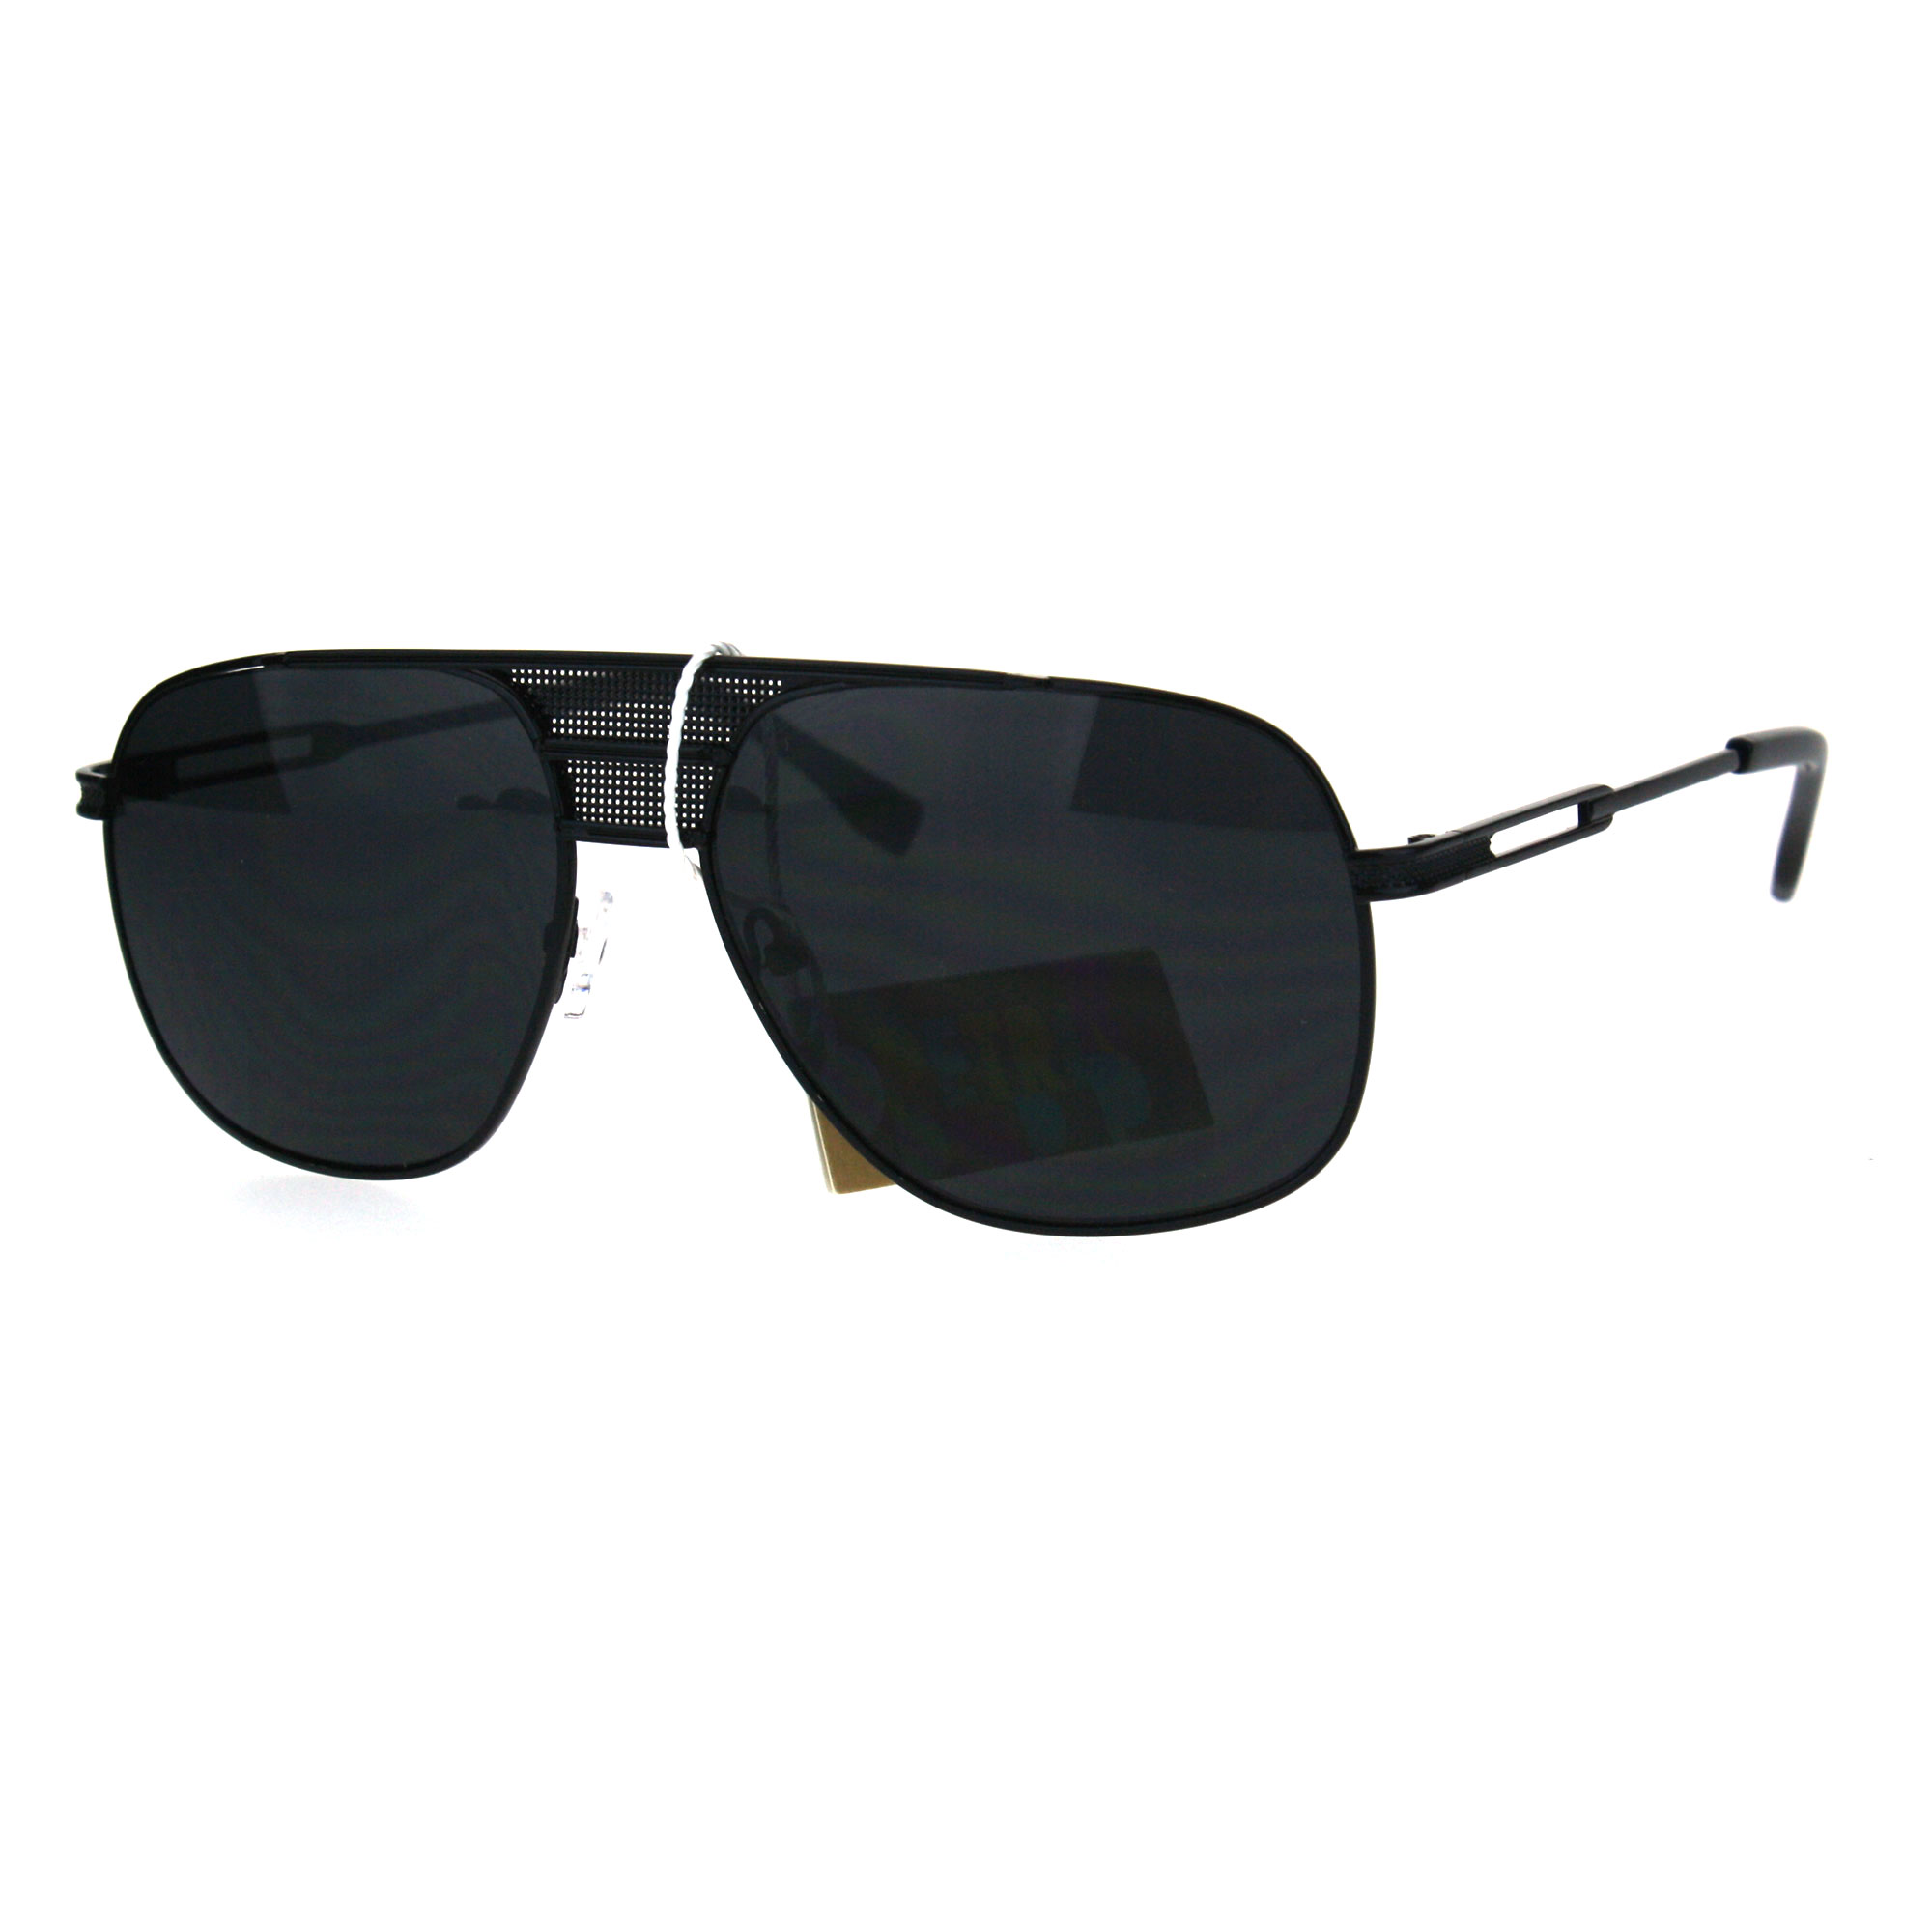 d0d8abcc609 Mens Oversized Aviator Sunglasses - Restaurant and Palinka Bar